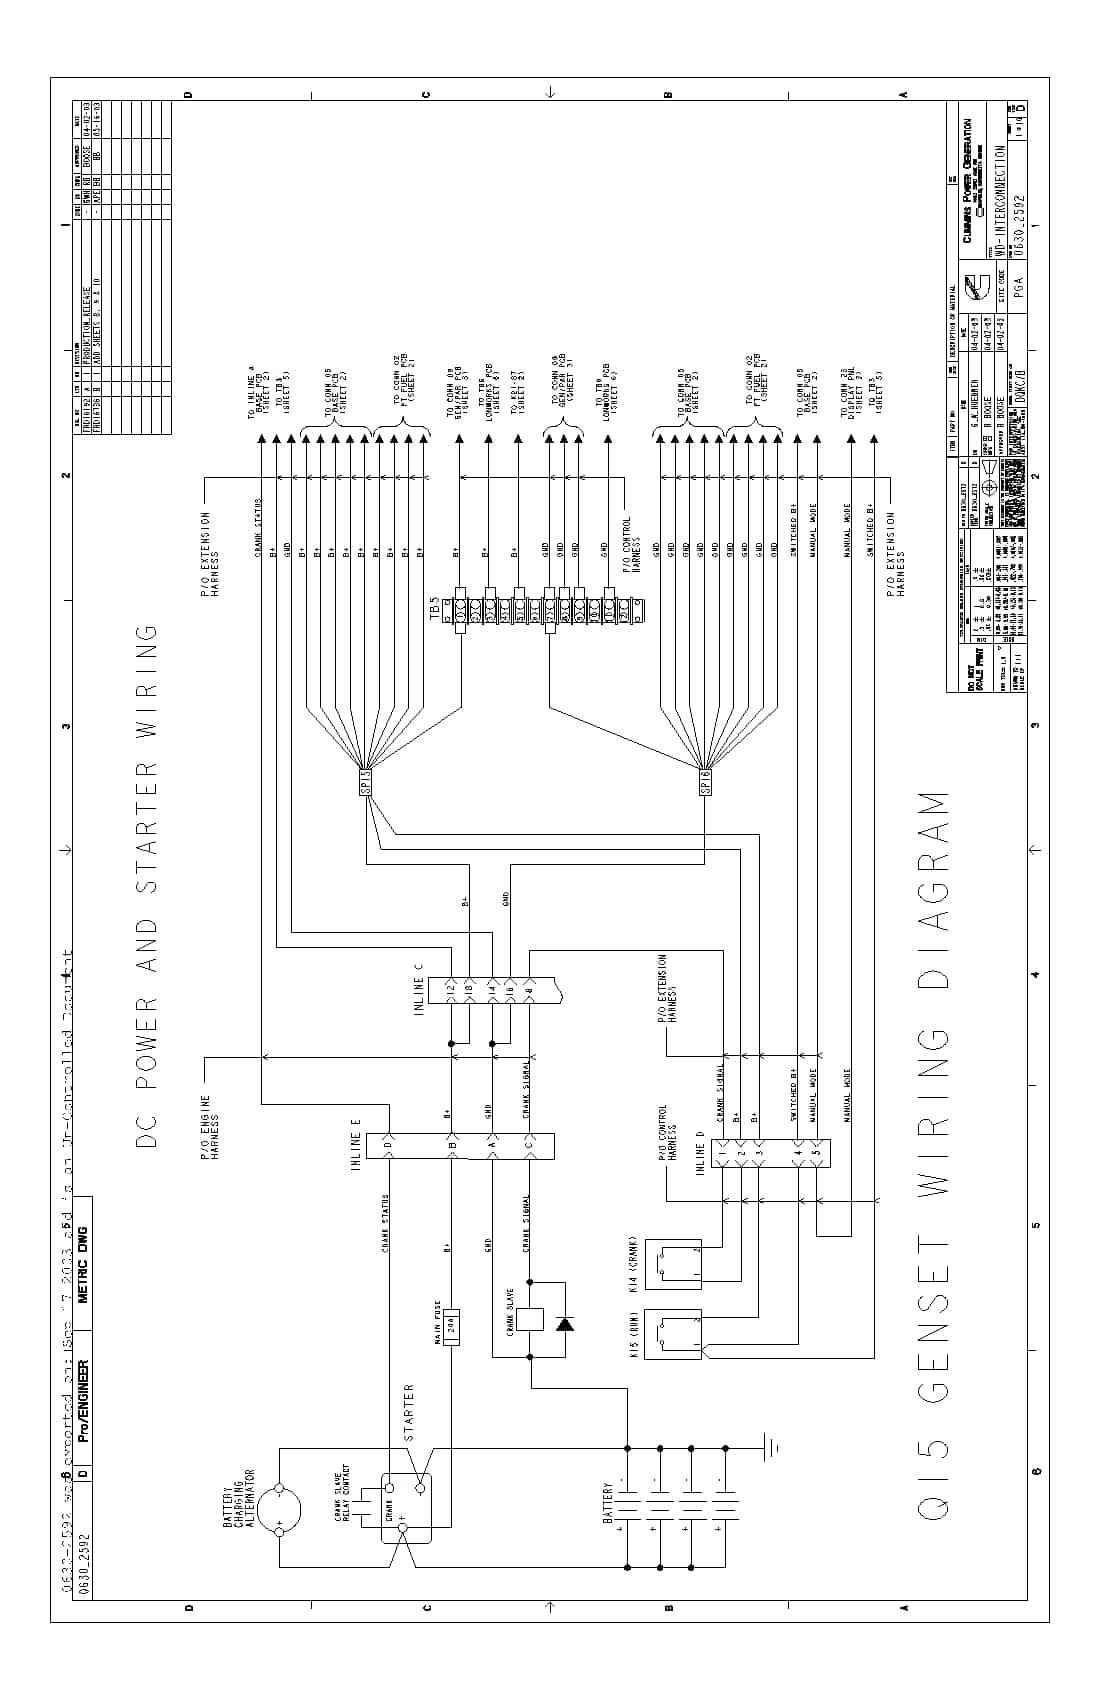 Cummins Power Generation 1400 73rd Ave Ne Minneapolis Minnesota Wiring Diagrams Pdf Download